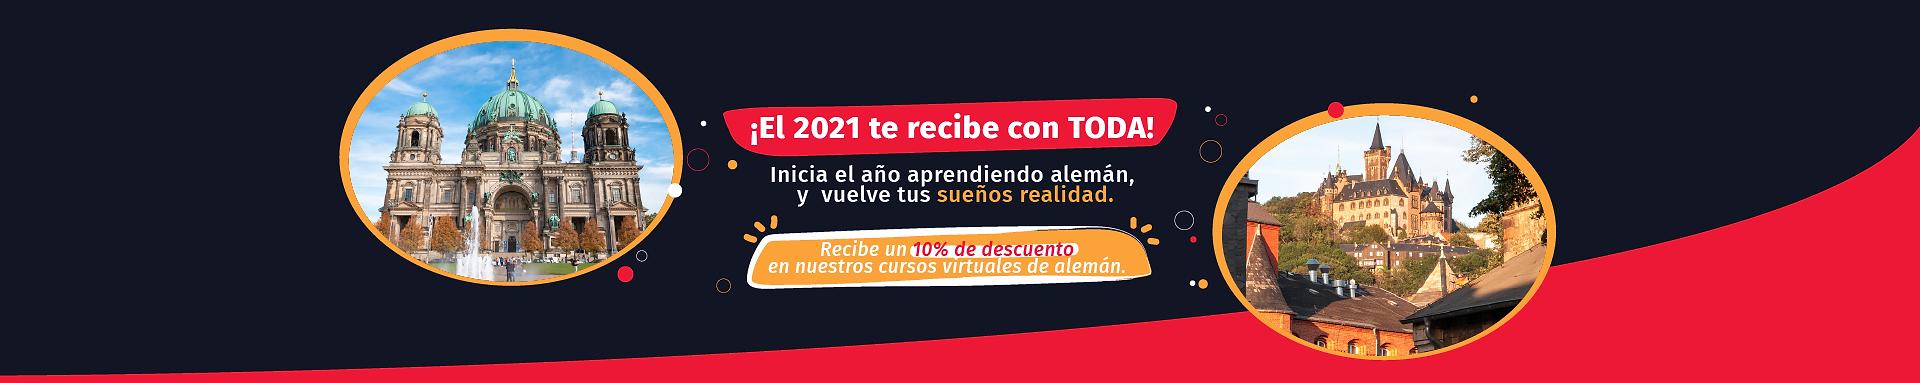 BANNER_ENERO_2021.png